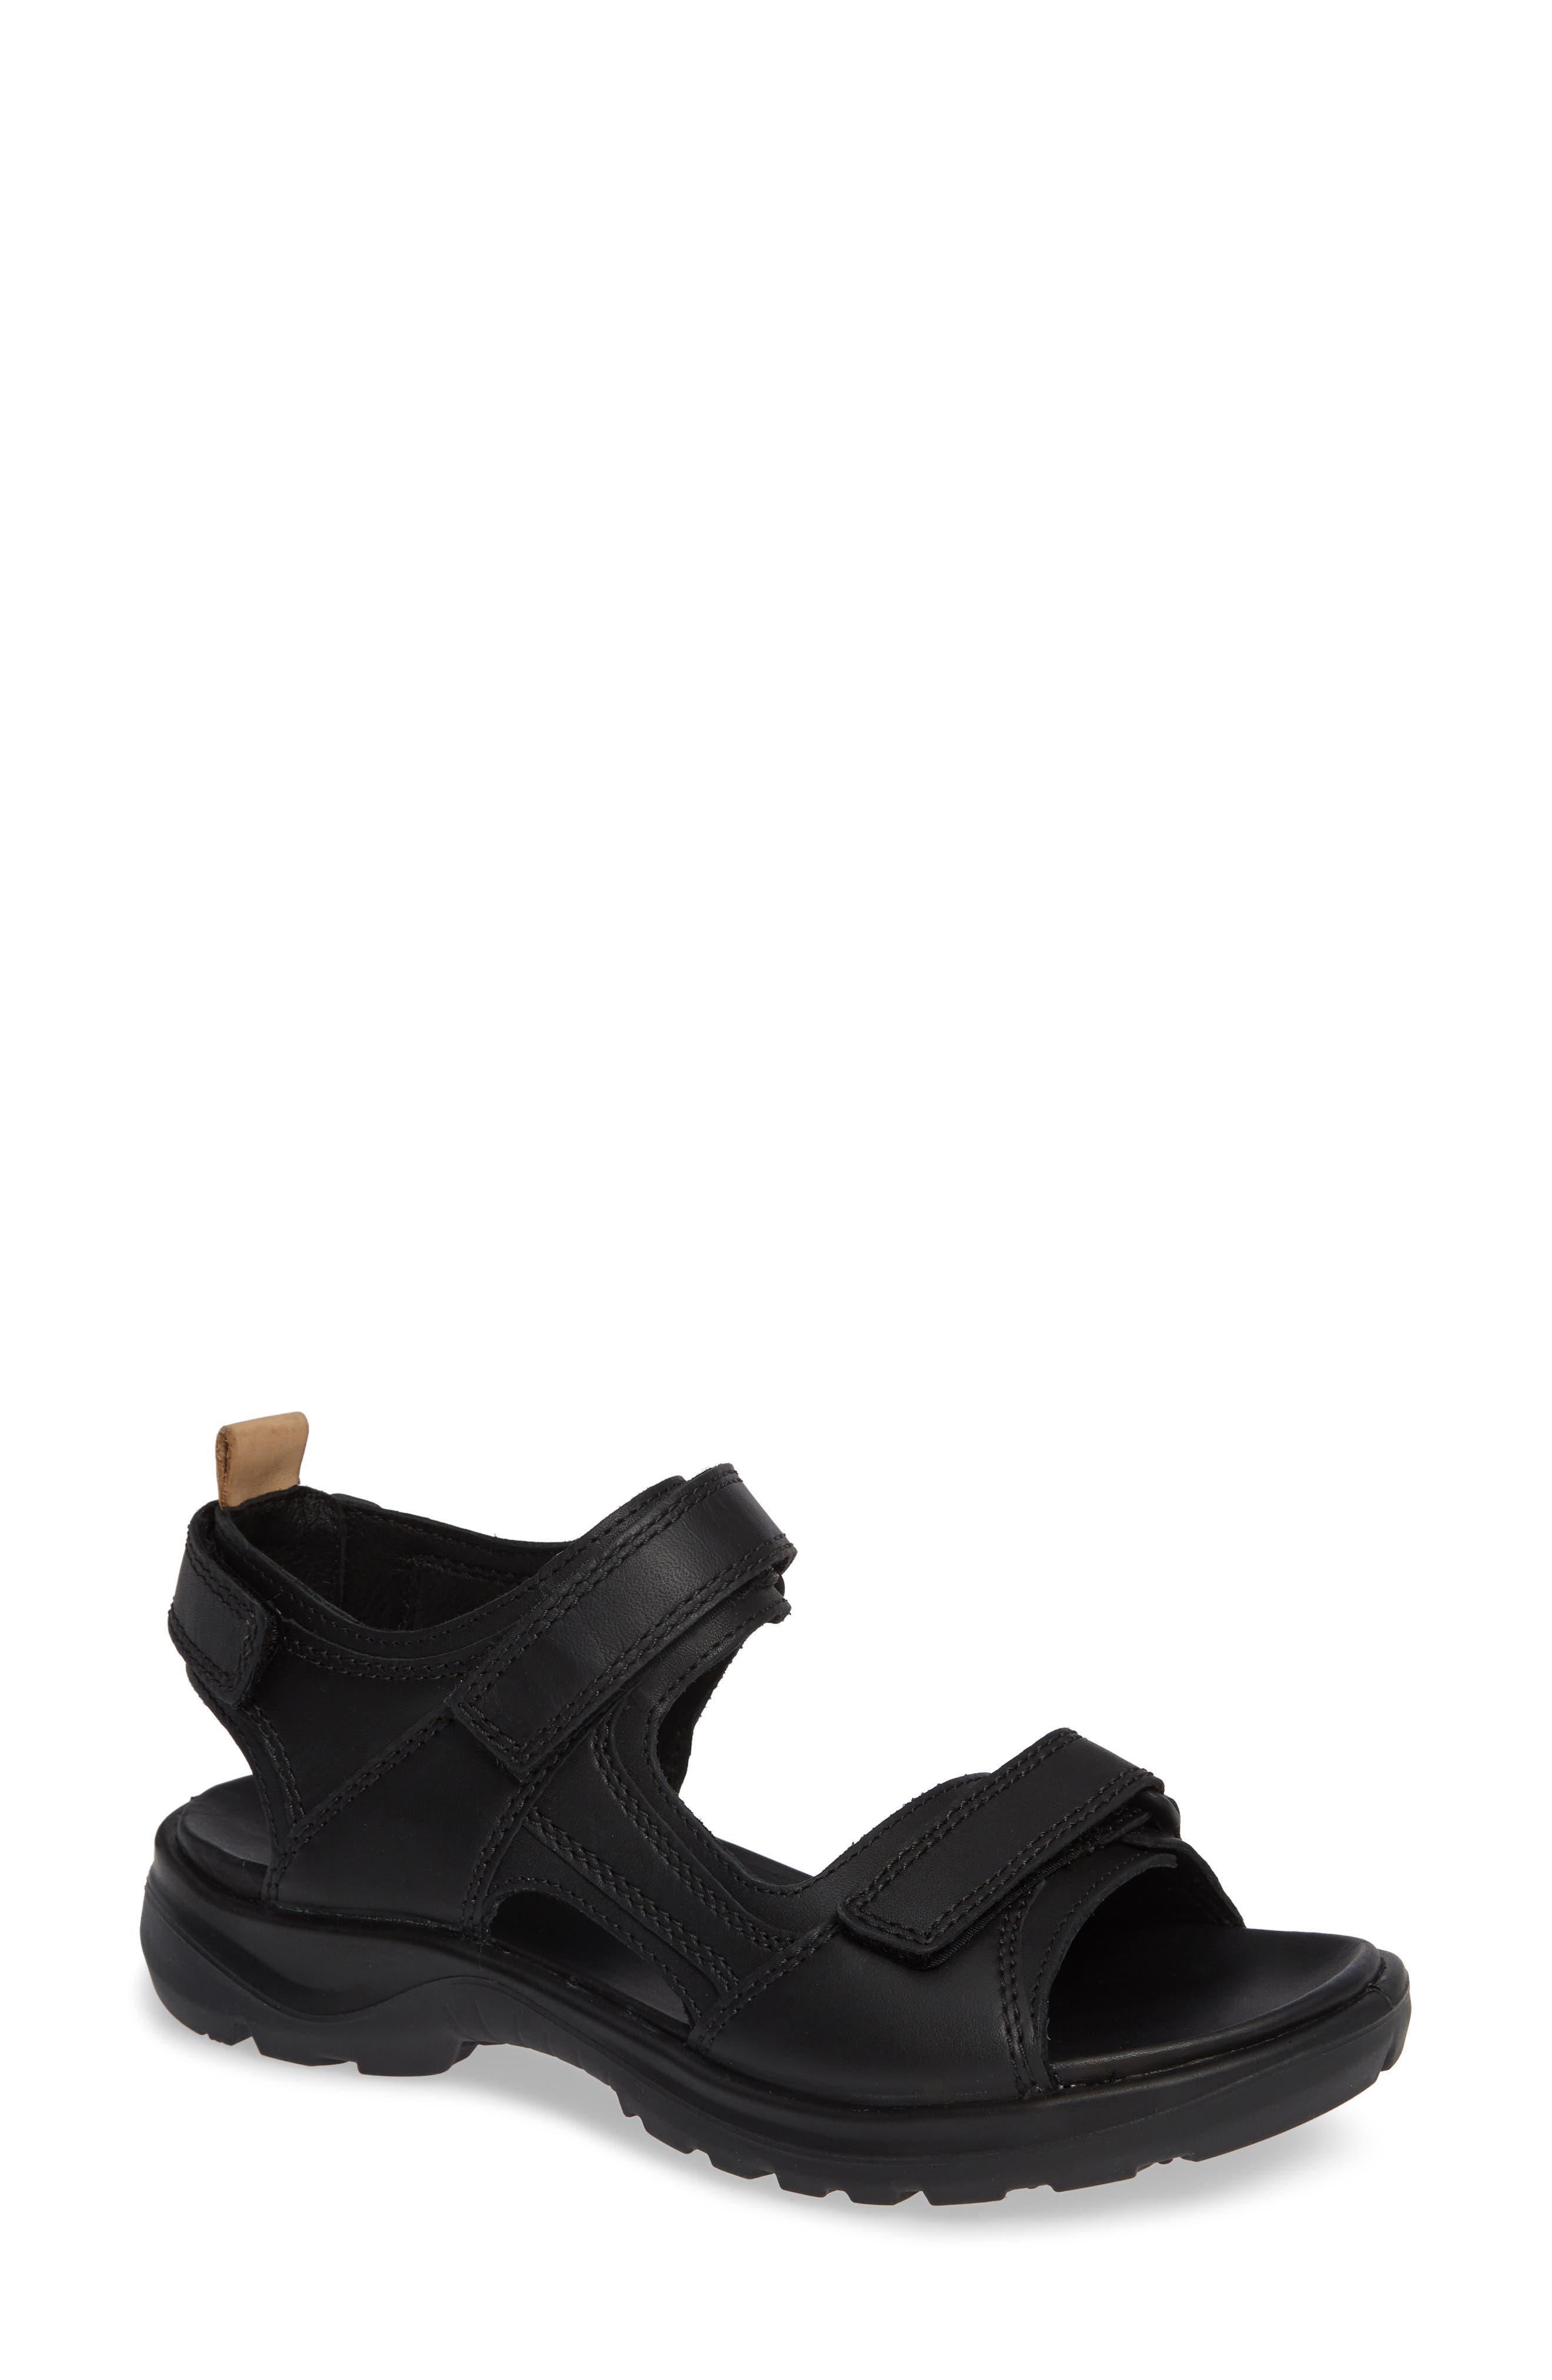 Premium Offroad Sandal,                             Main thumbnail 1, color,                             BLACK NUBUCK LEATHER